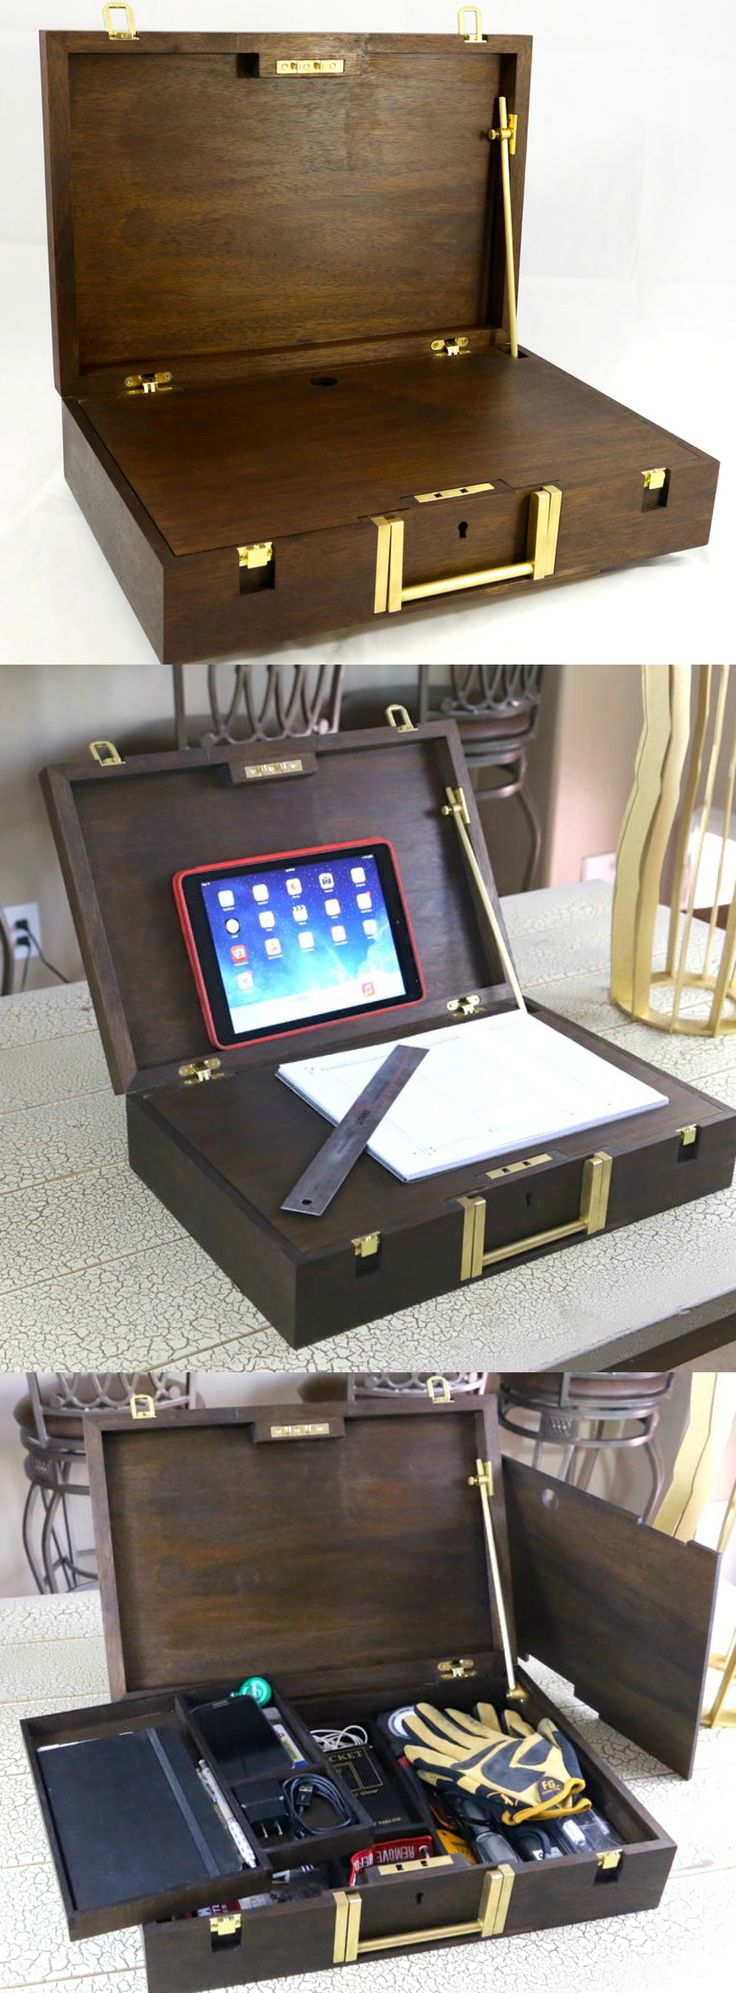 Portable lap desk techshop tool kit lap desk tool kit and storage organization - Wood lap desk with storage ...